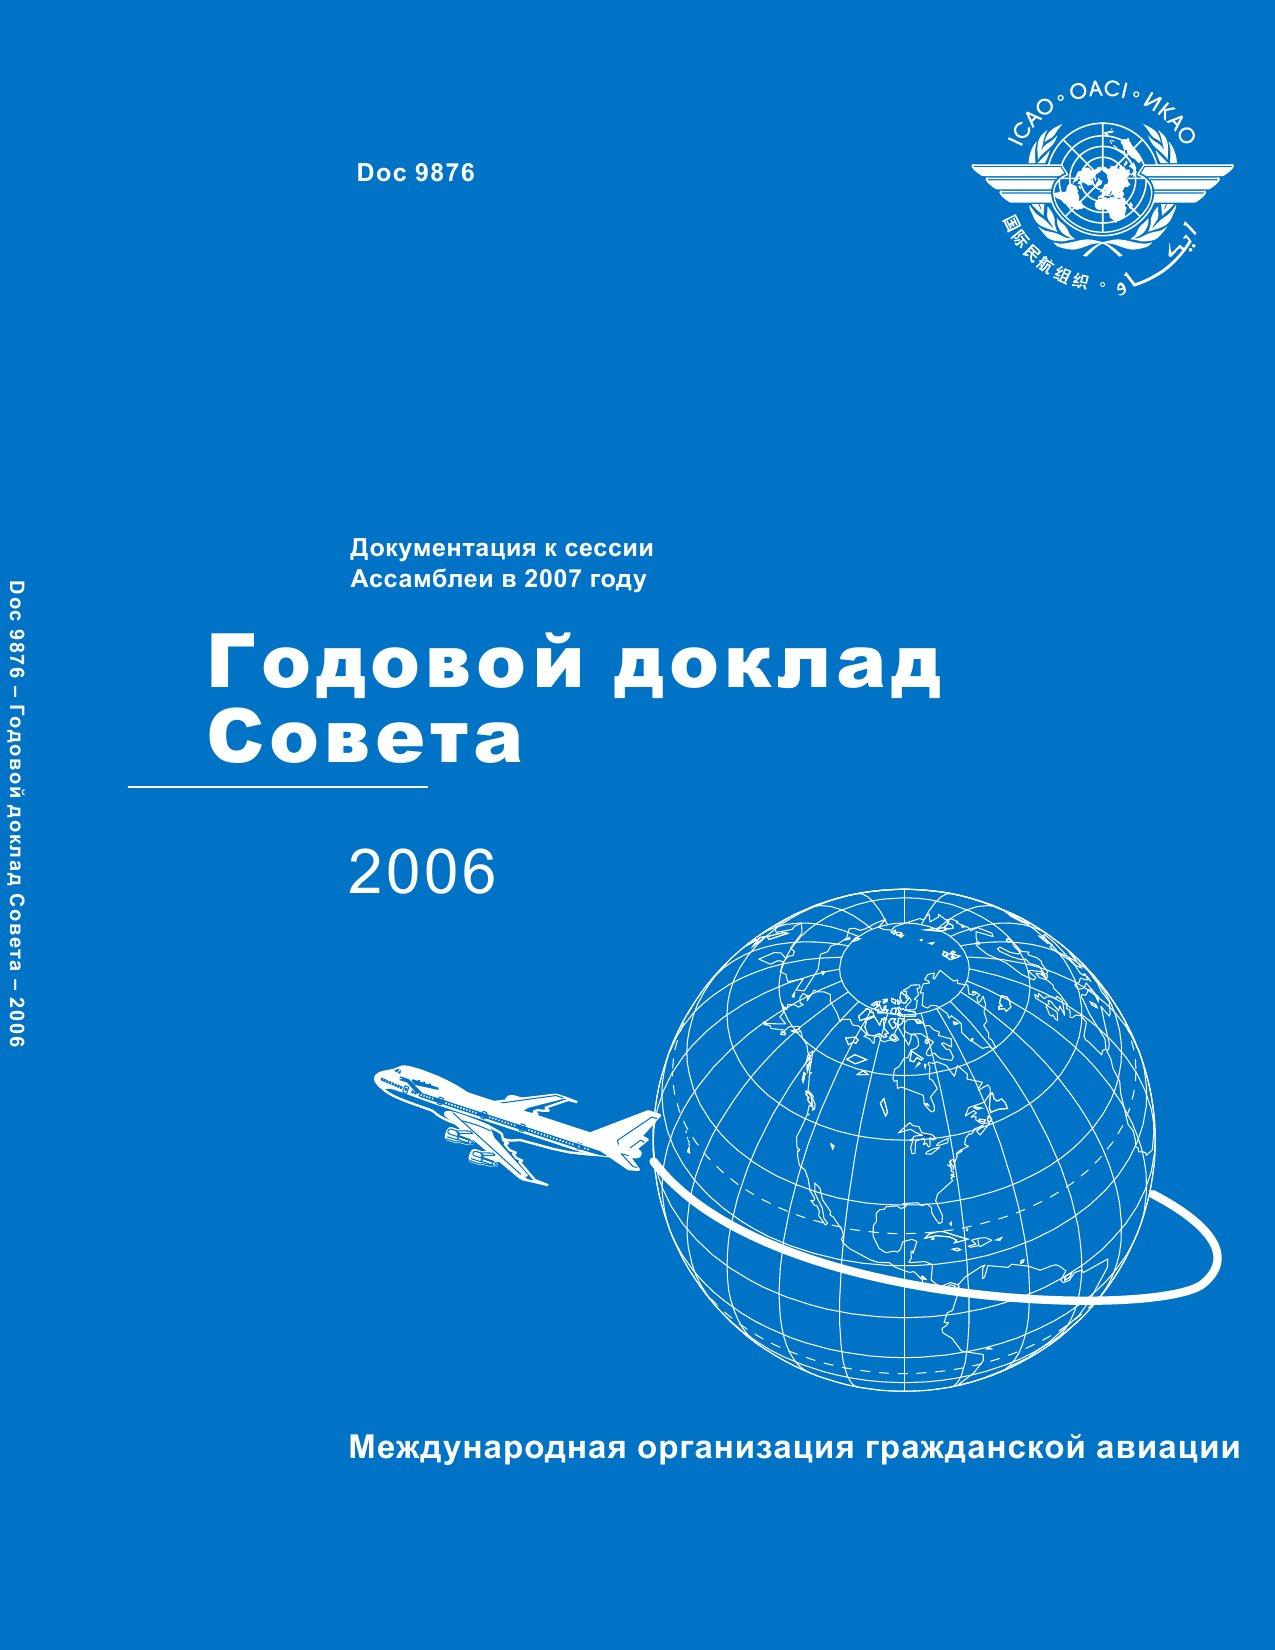 ICAO Doc 9876 Годовой доклад Совета - 2006